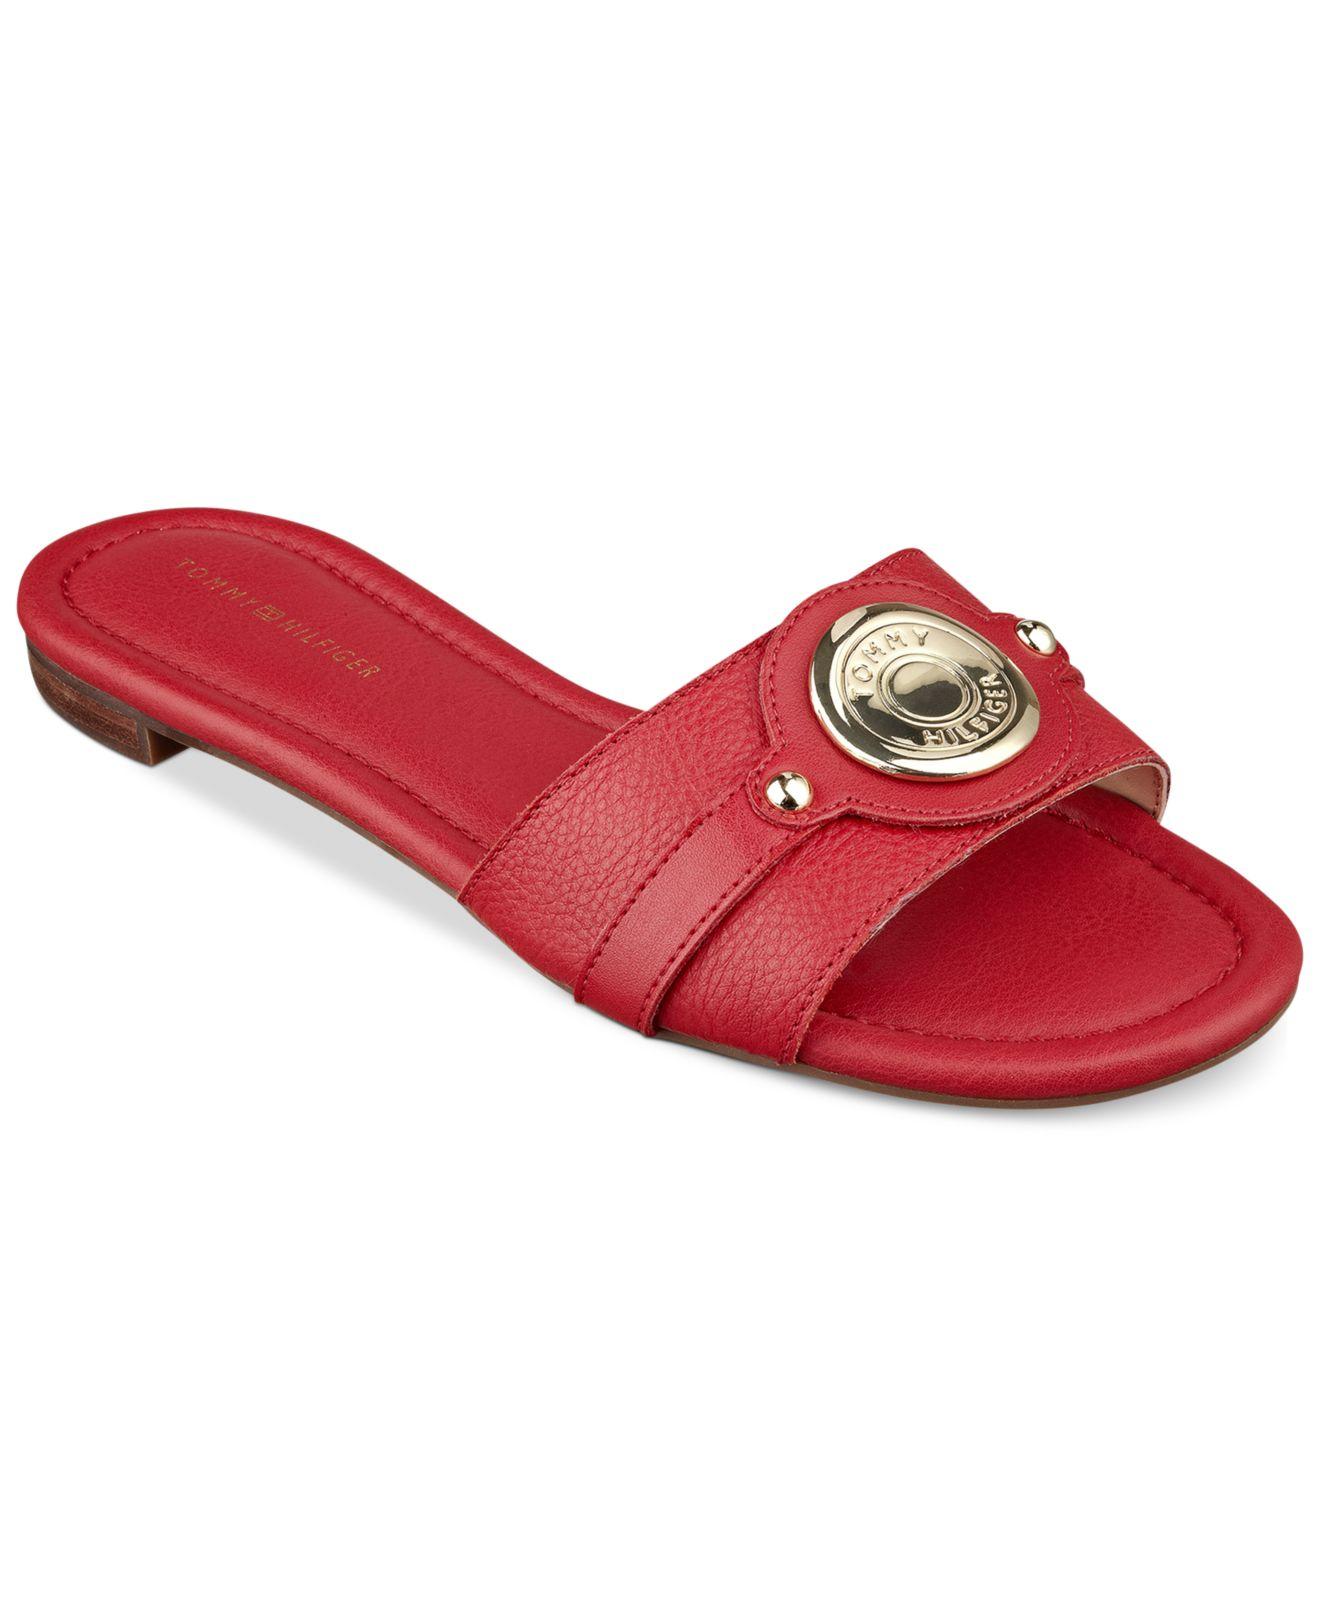 6f3e048c6 Lyst - Tommy Hilfiger Women S Icela Slide Sandals in Red